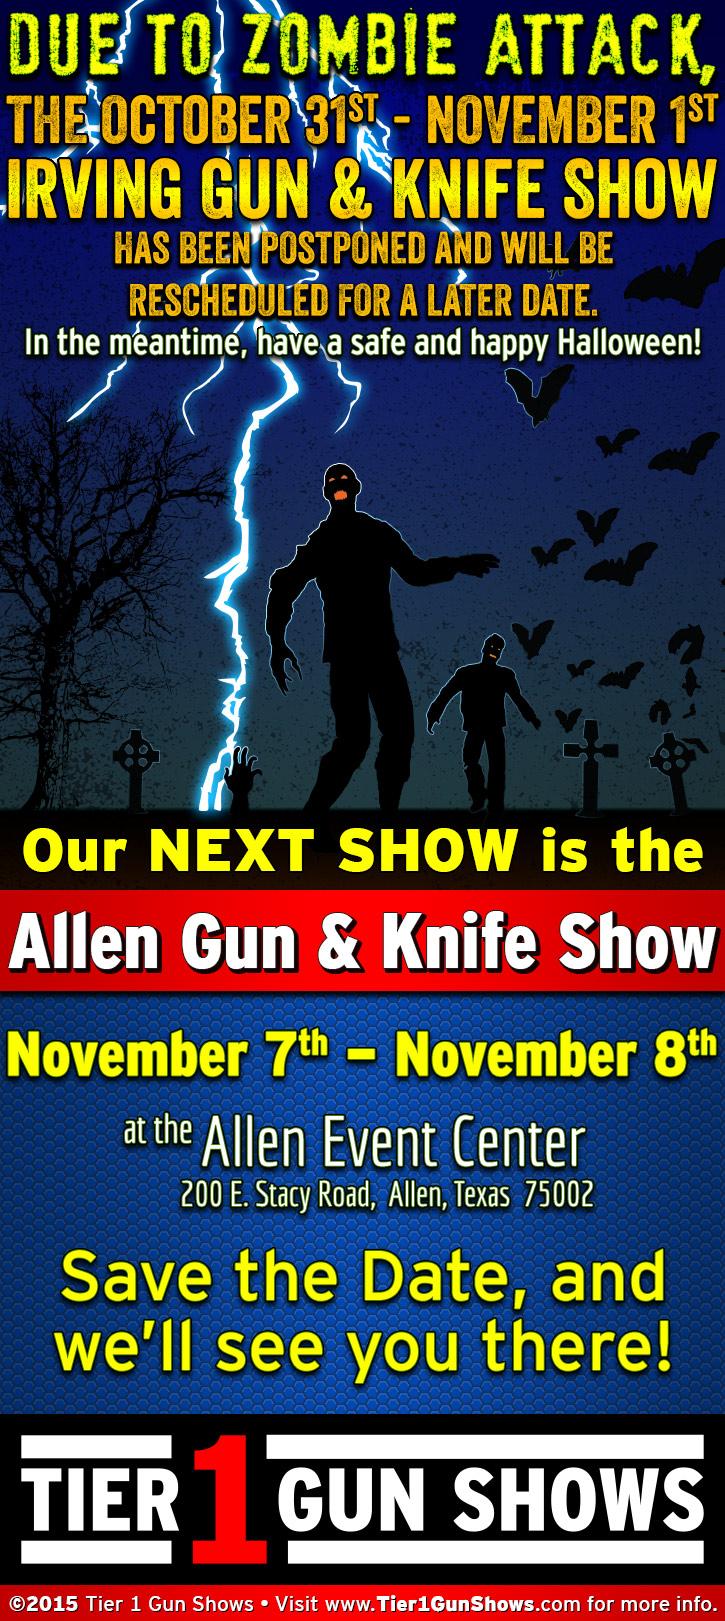 Irving-Convention-Center---October-31-November-1,-2015e